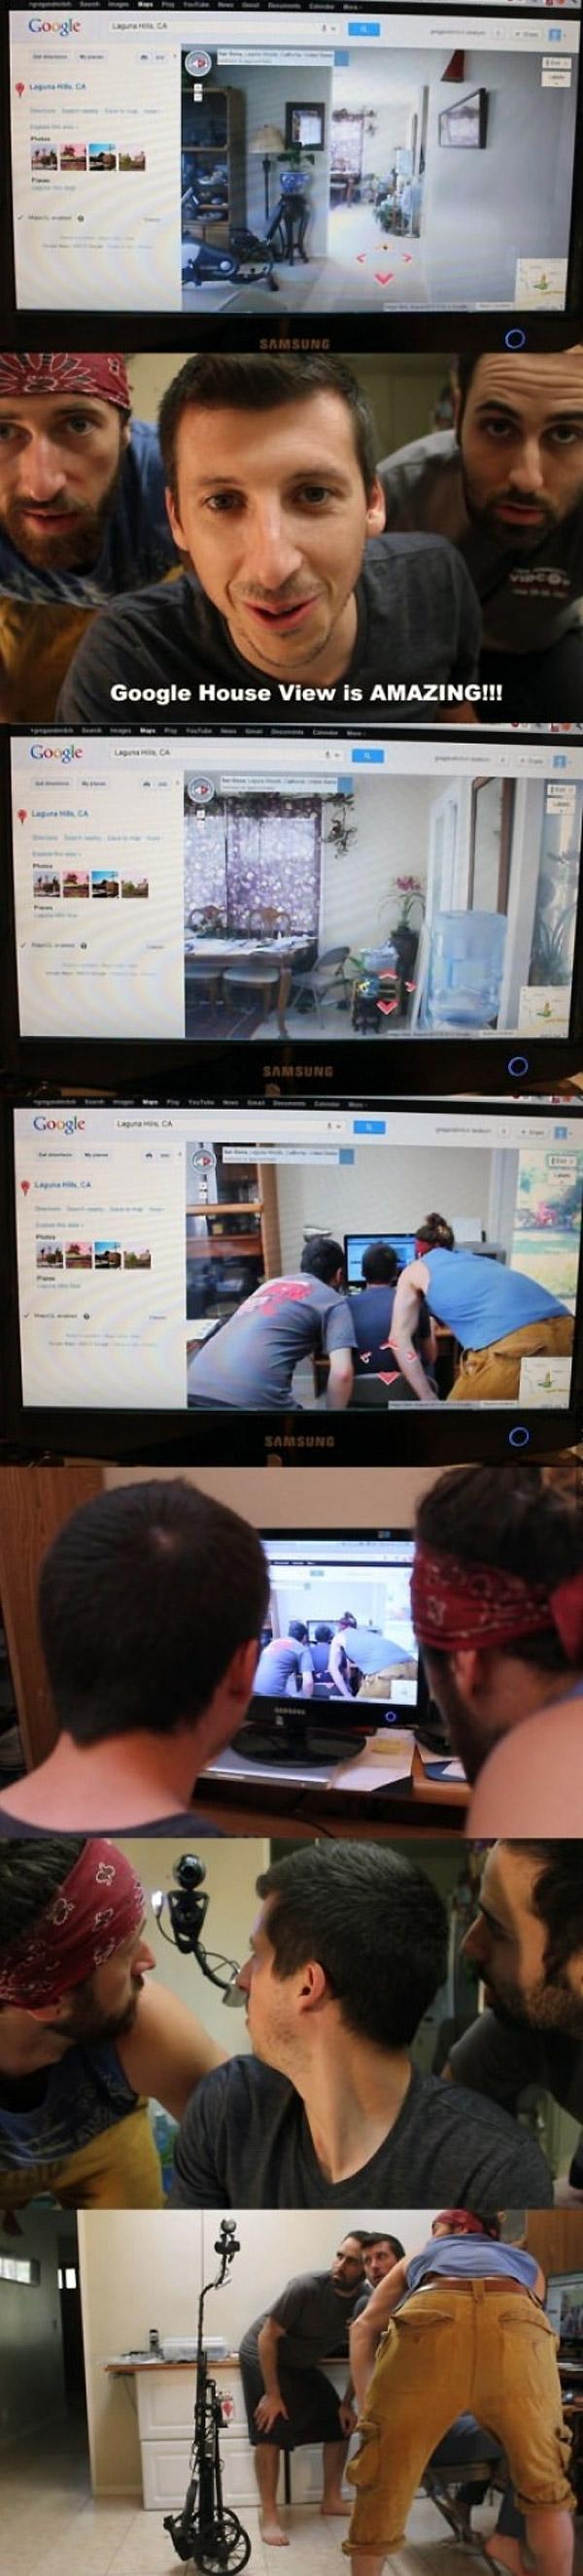 Llega Google House View